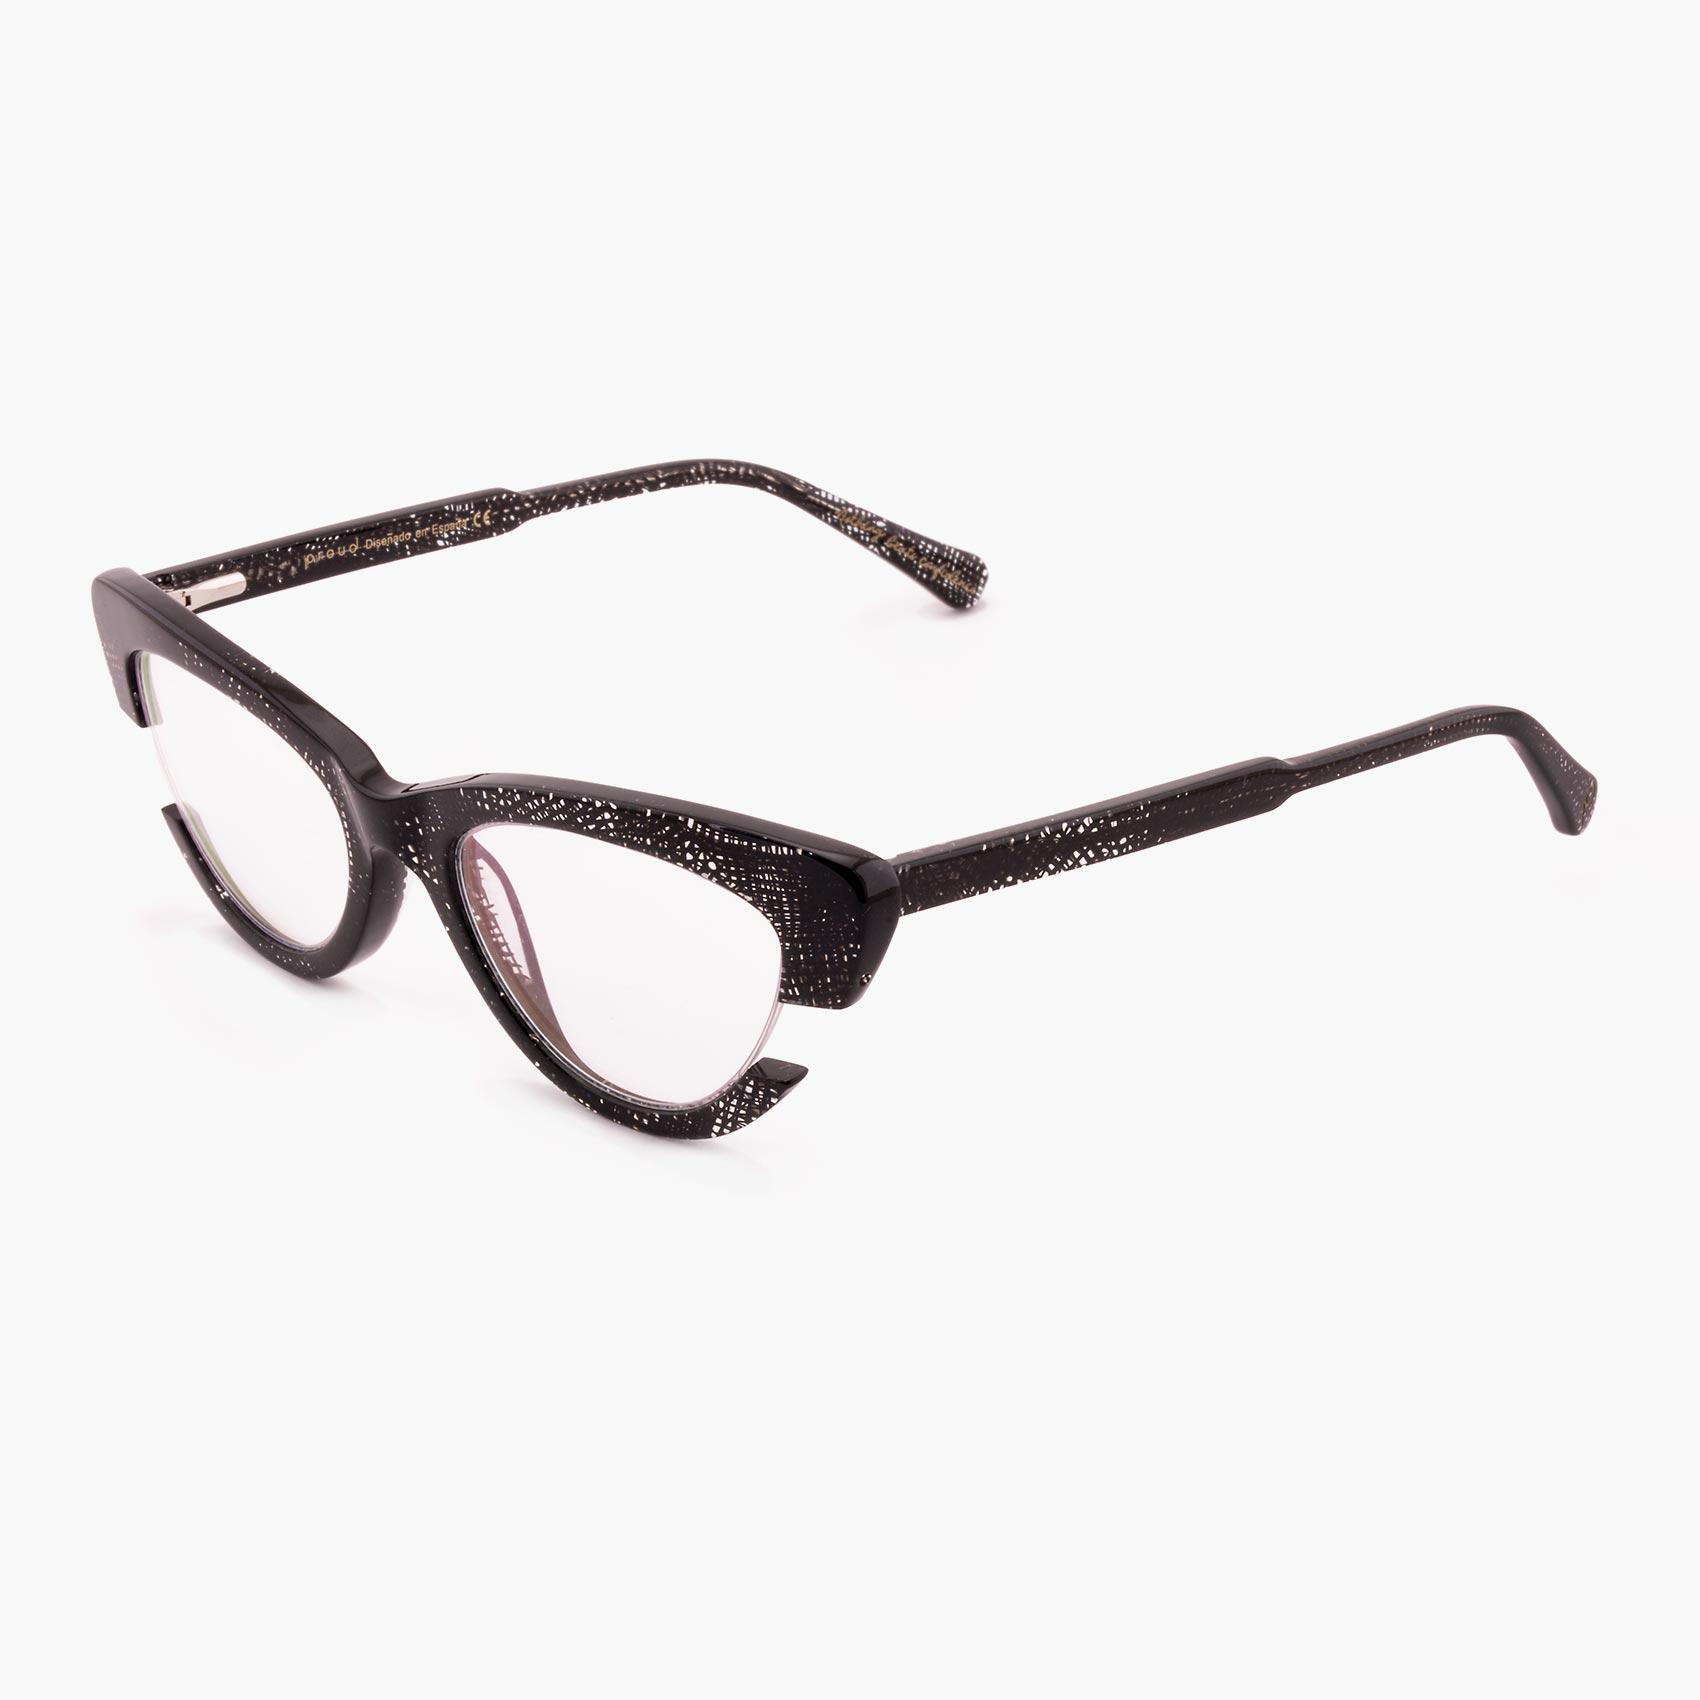 Proud eyewear Jennifer C1 P gafas de vista mujer